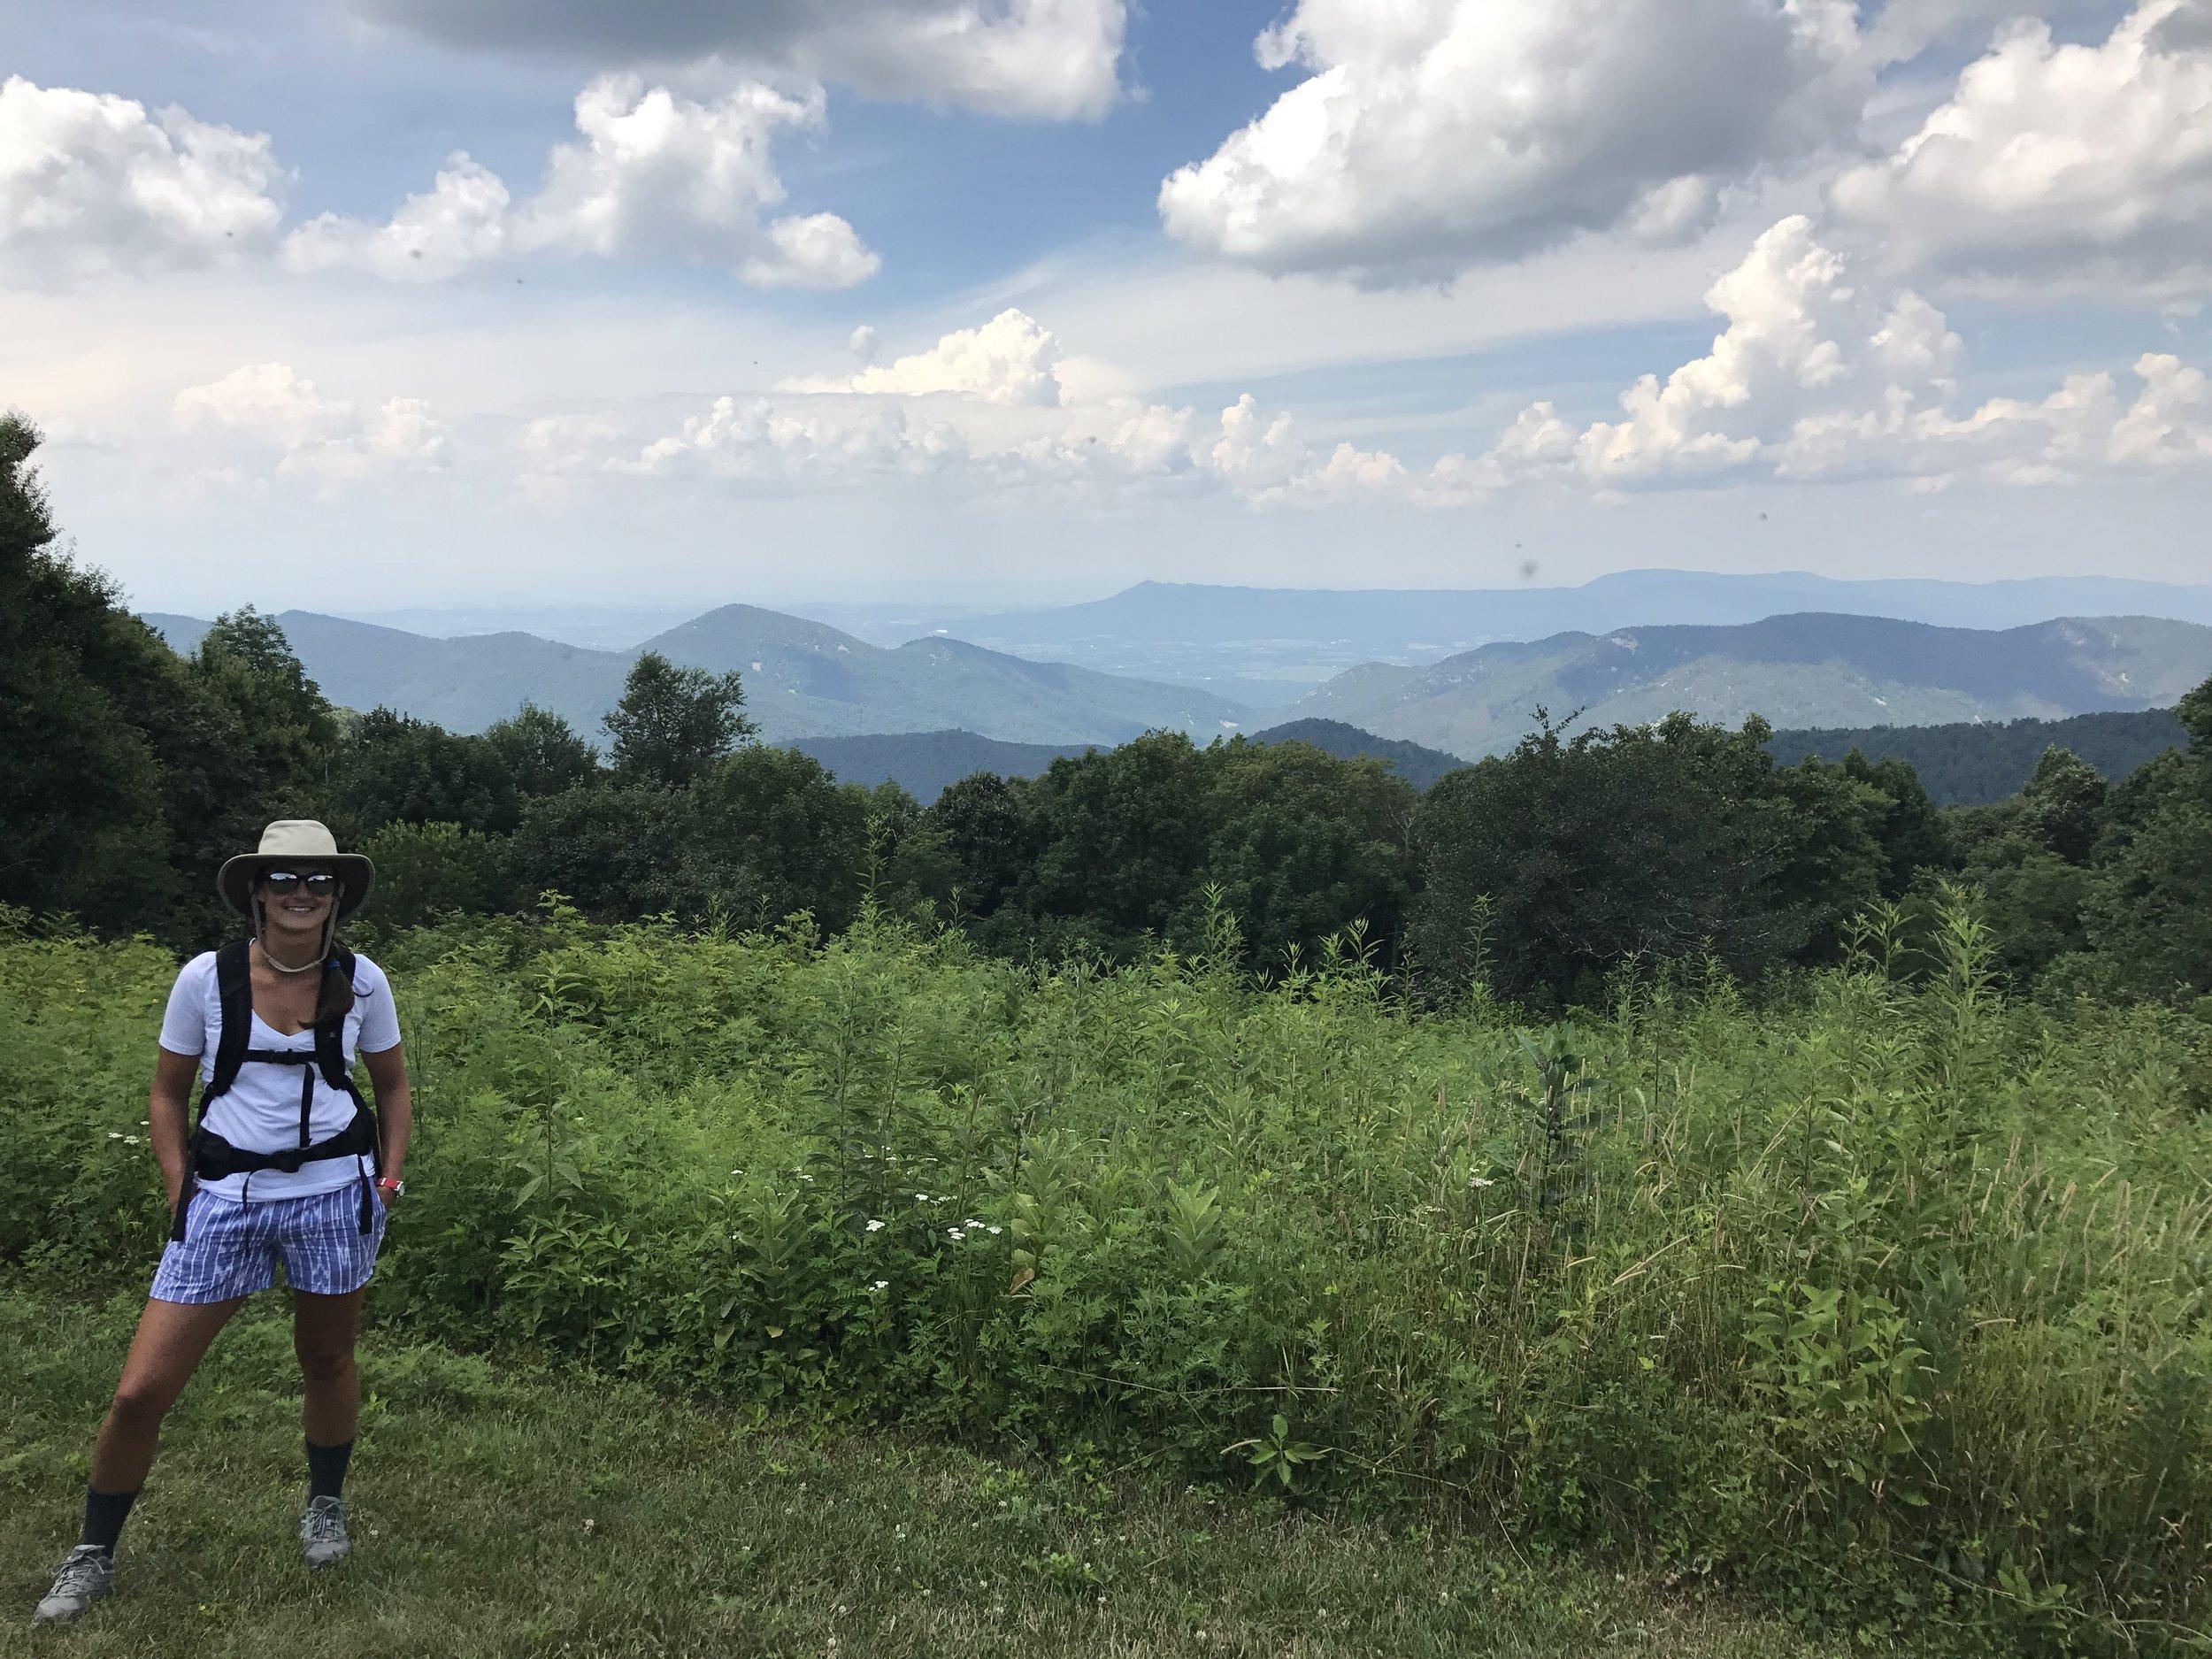 Shenandoah Views (those black spots are gnats flying around...ugh)